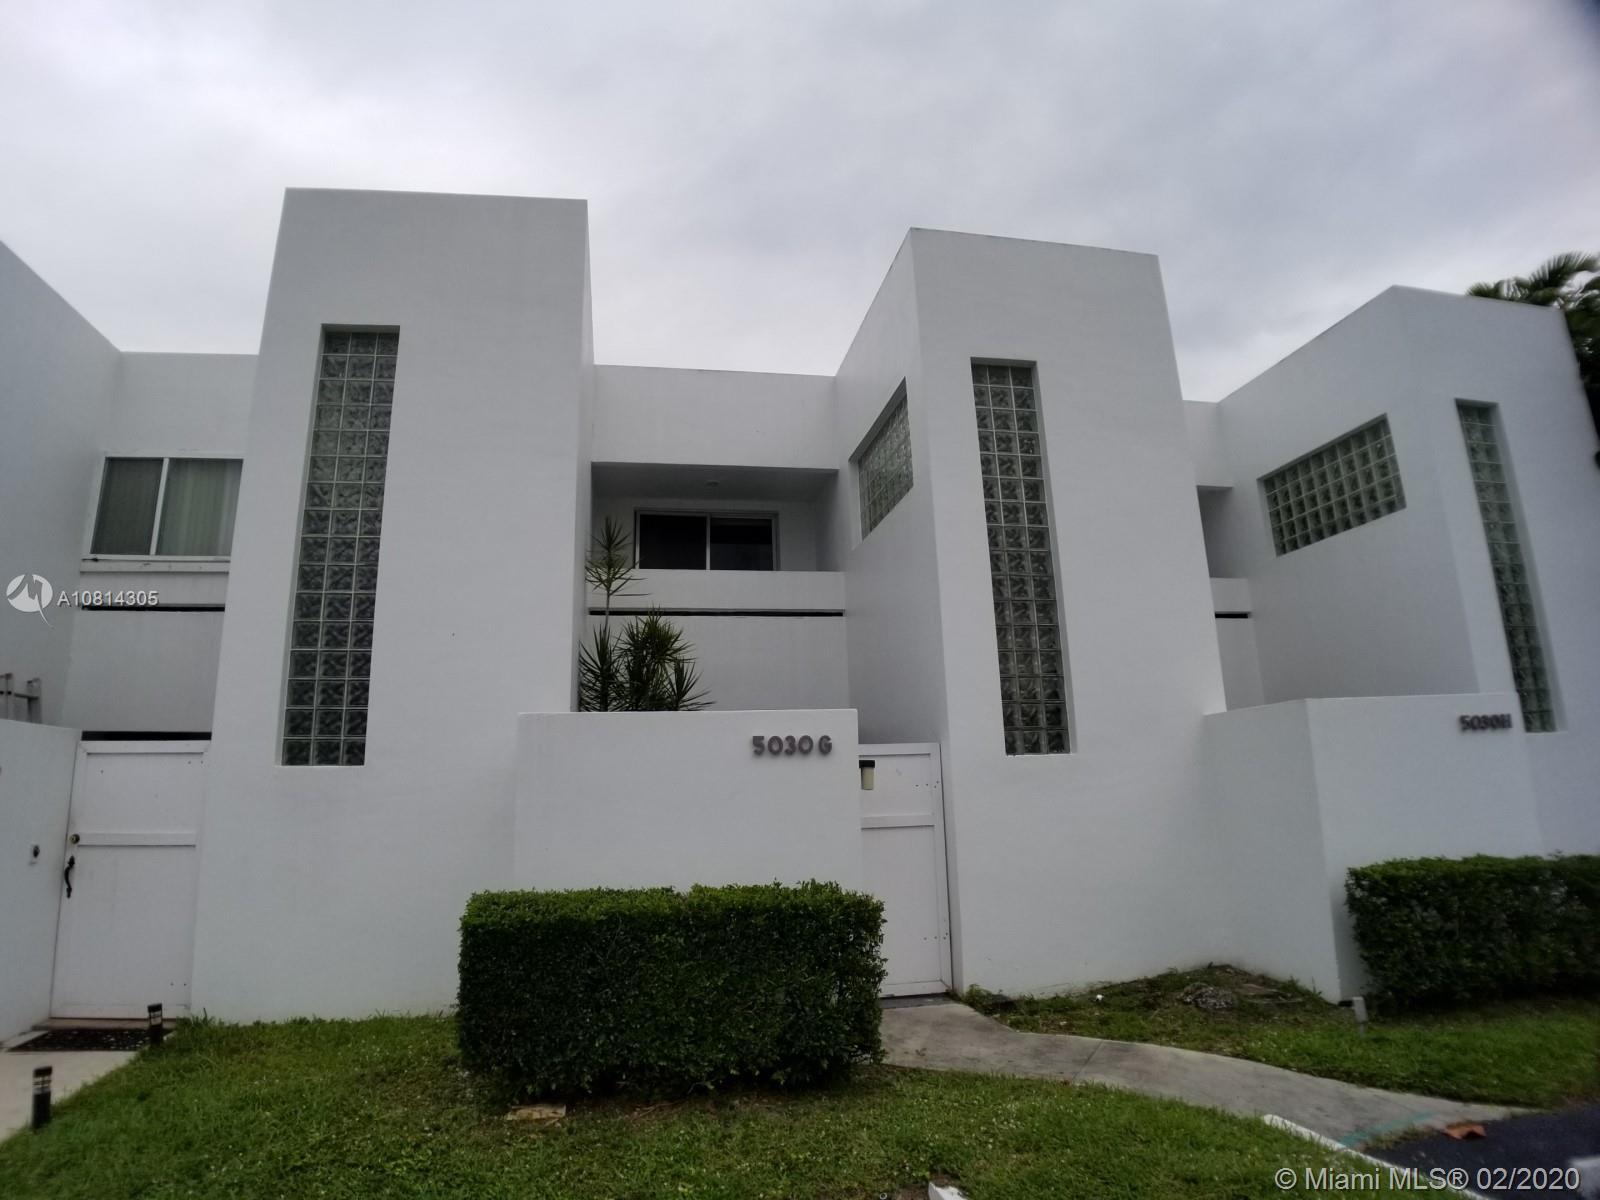 5030 Elmhurst Rd G, West Palm Beach, FL 33417